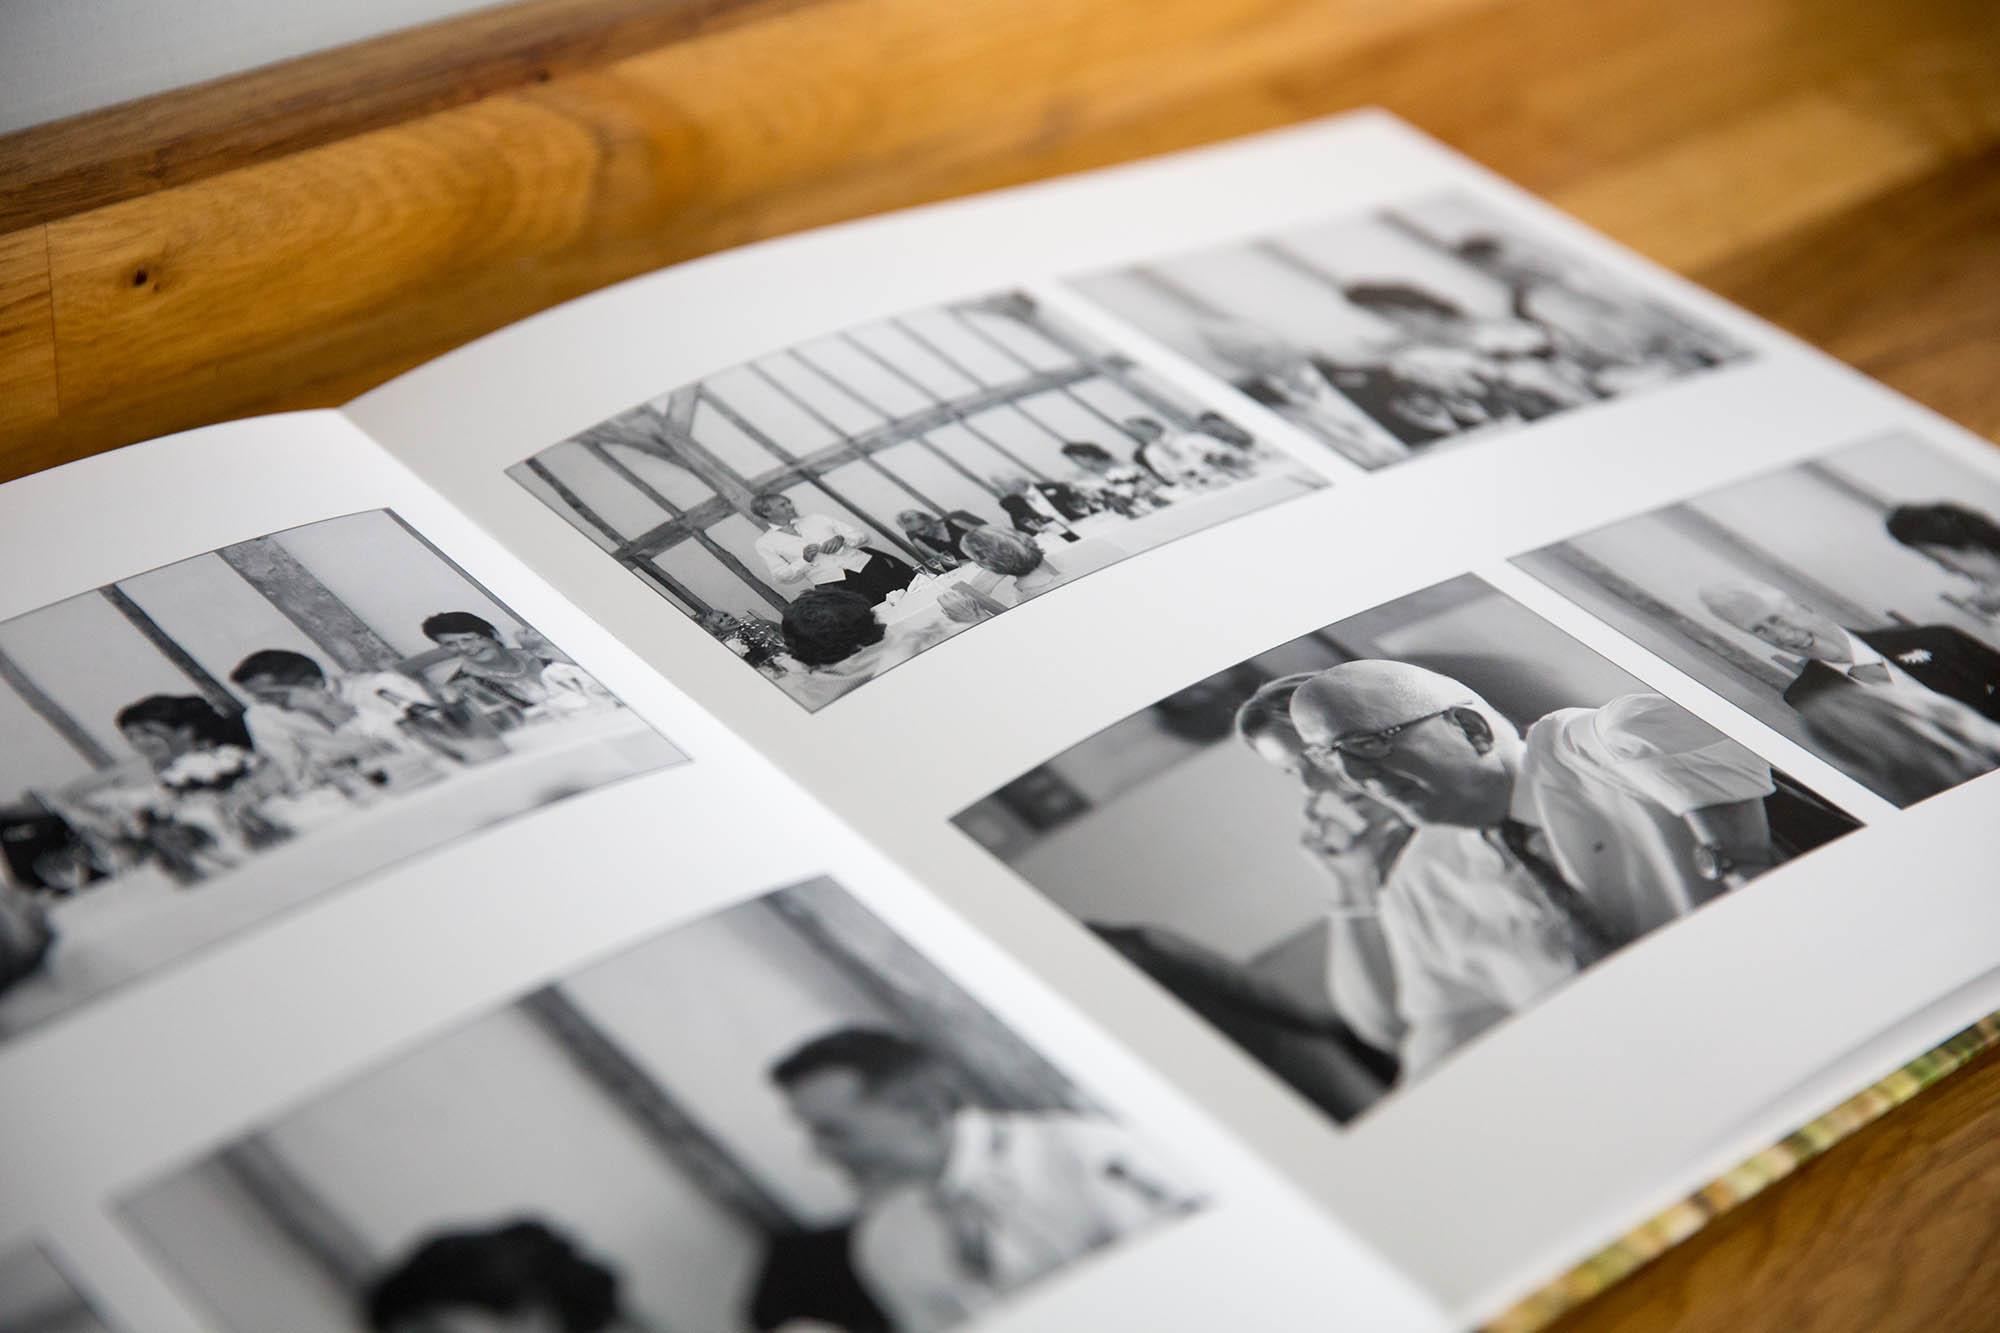 Julia_toms_wedding_album_story_book_008.jpg